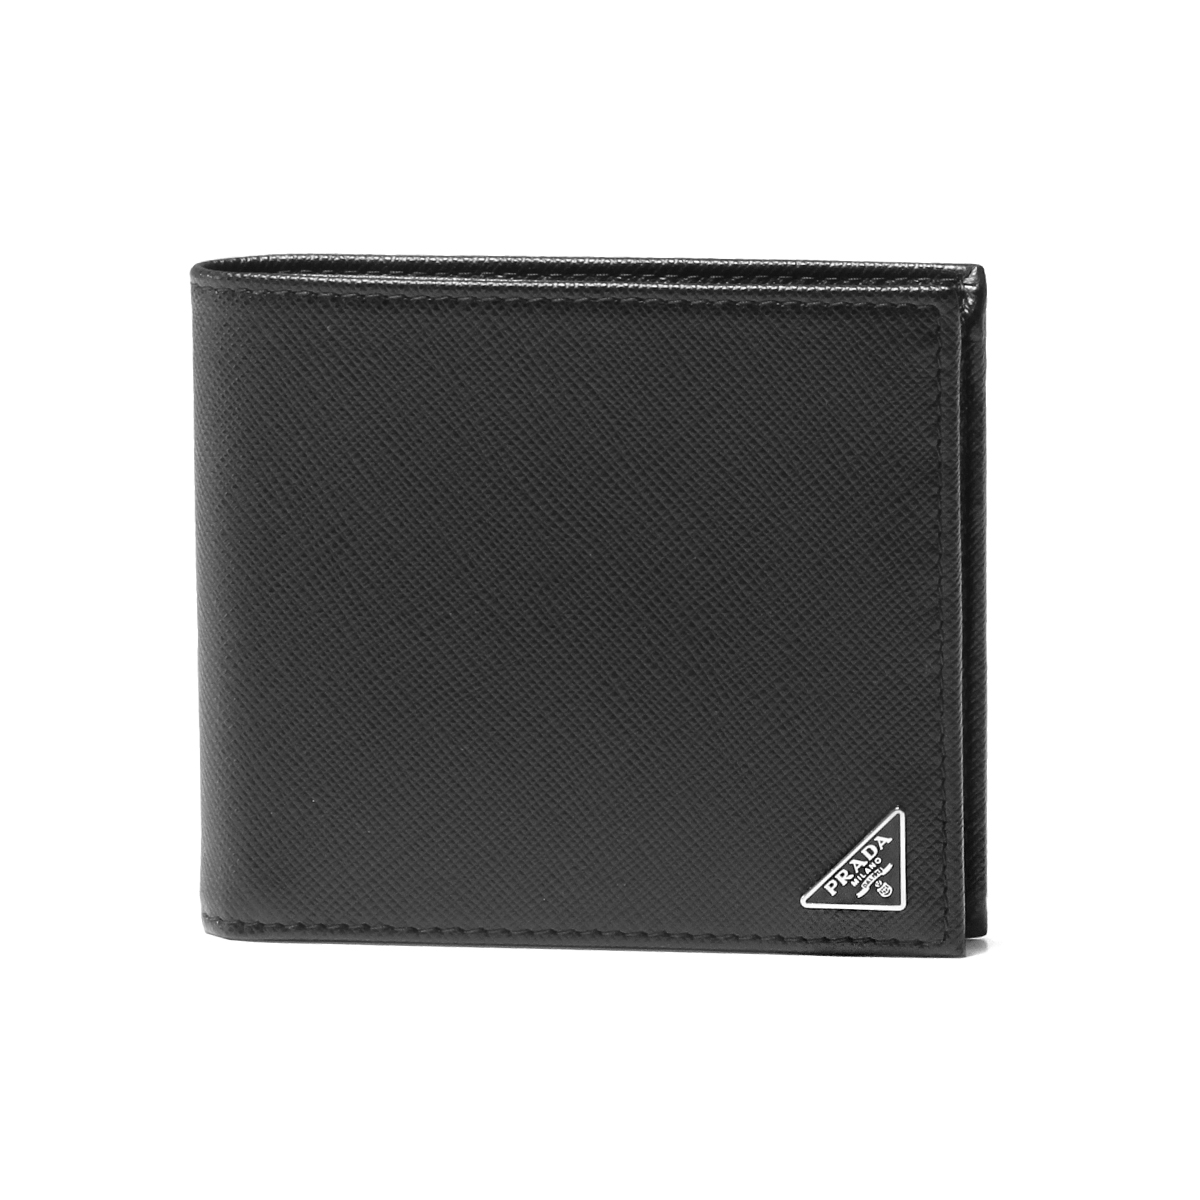 Prada PRADA wallet men 2MO738 QHH F0002 folio wallet SAFFIANO TRIANGOLO  NERO black